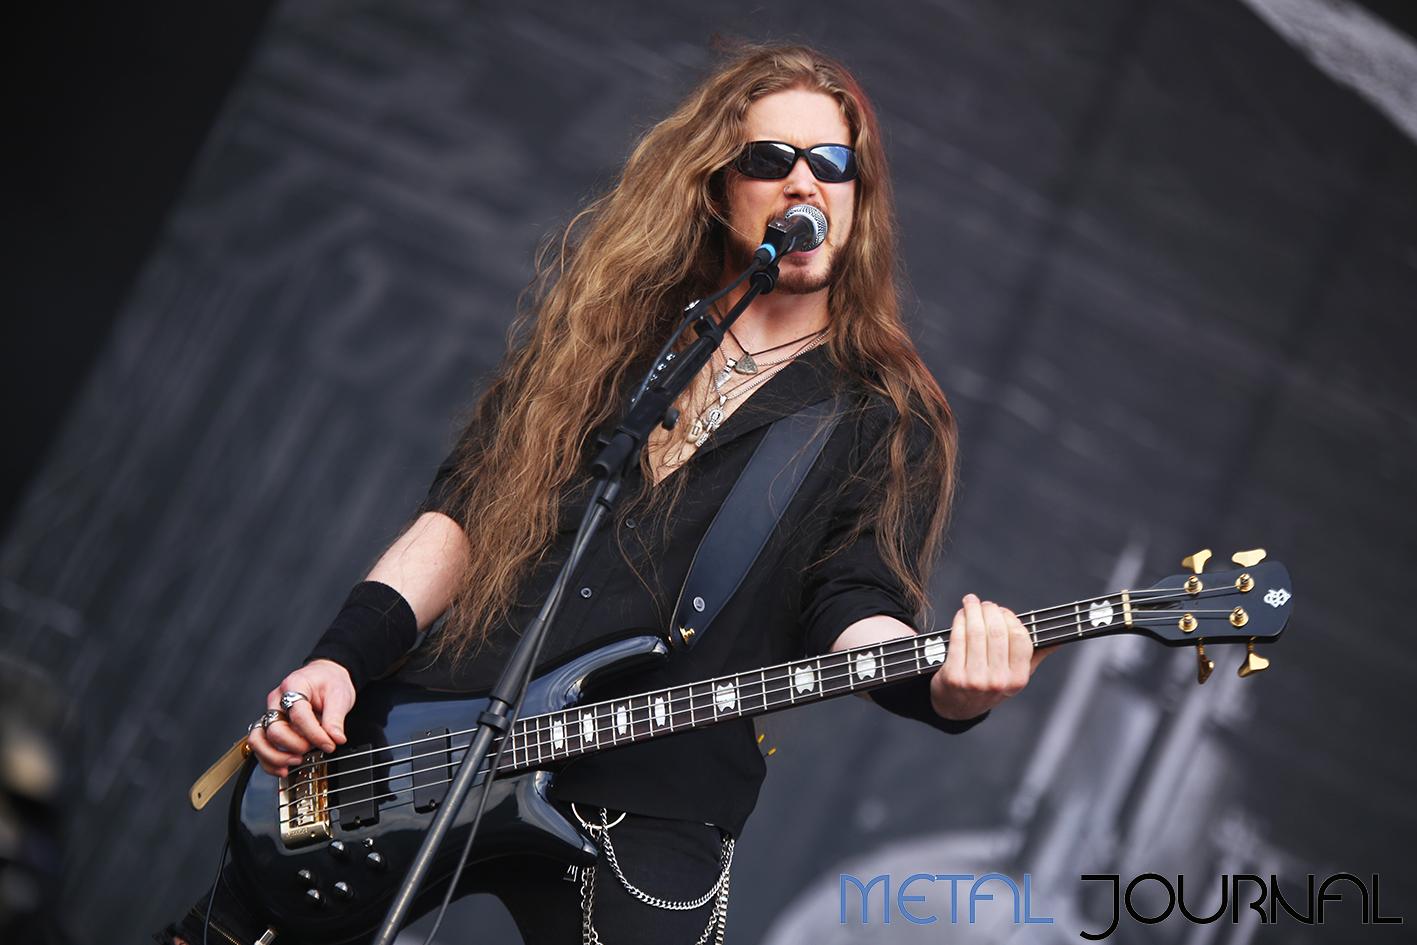 udo - metal journal rock fest barcelona 2019 pic 7